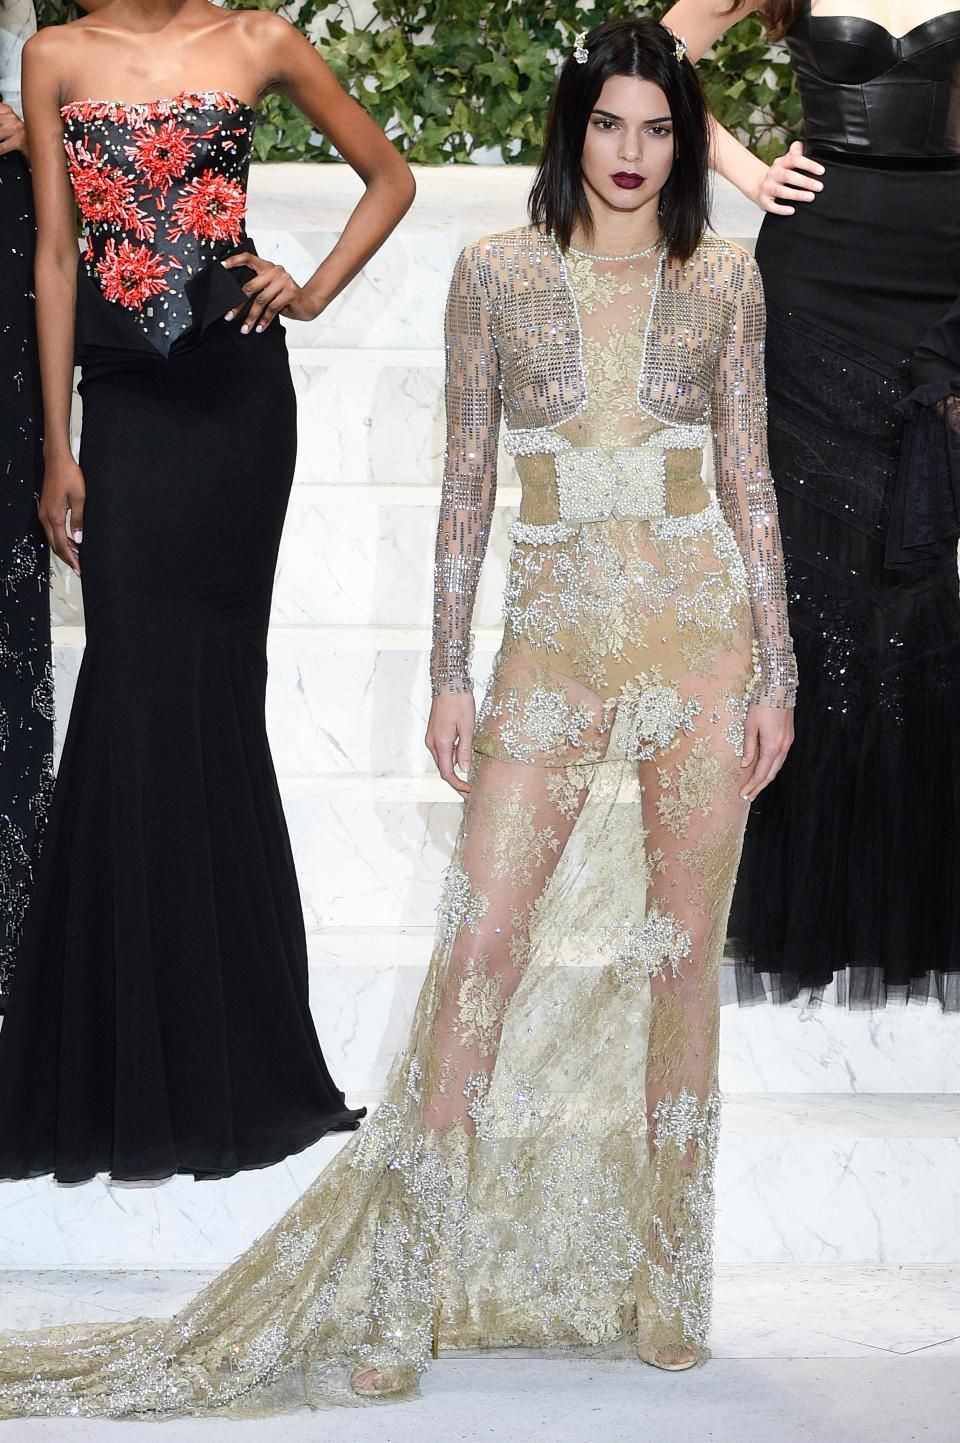 New York Ny February 09 Kendall Jenner Walks The Runway At La Perla Fashion Show Fall Winter 2017 20 Fashion New York Fashion Week 2017 Formal Dresses Long